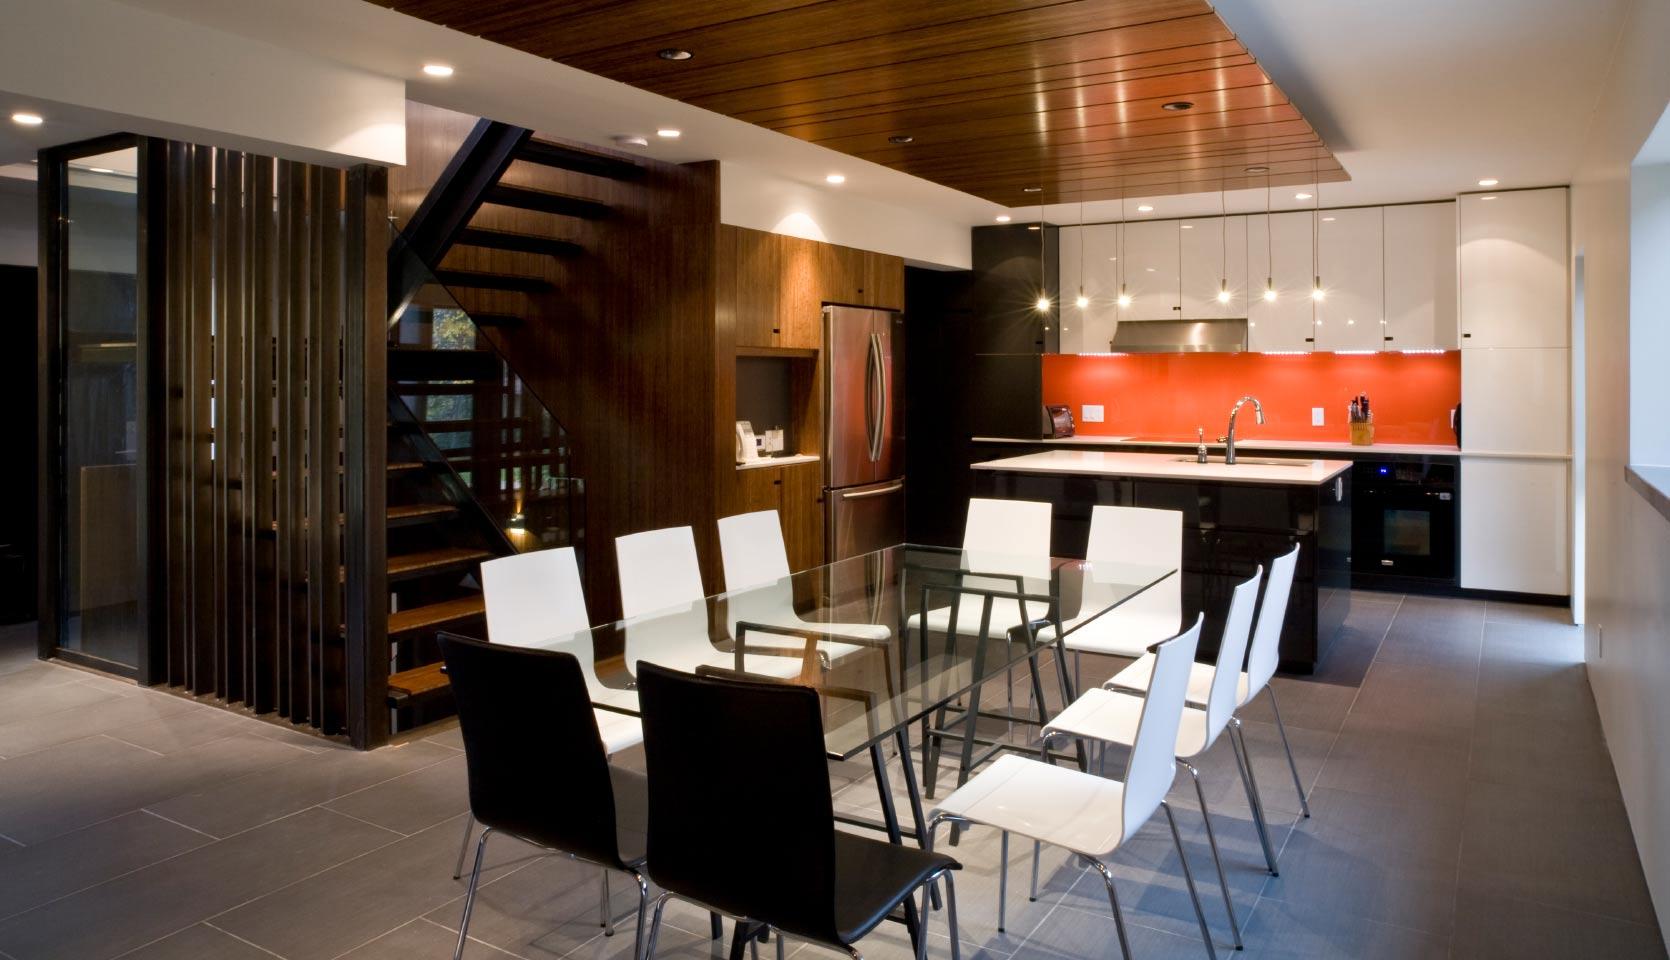 north-york-house-dining